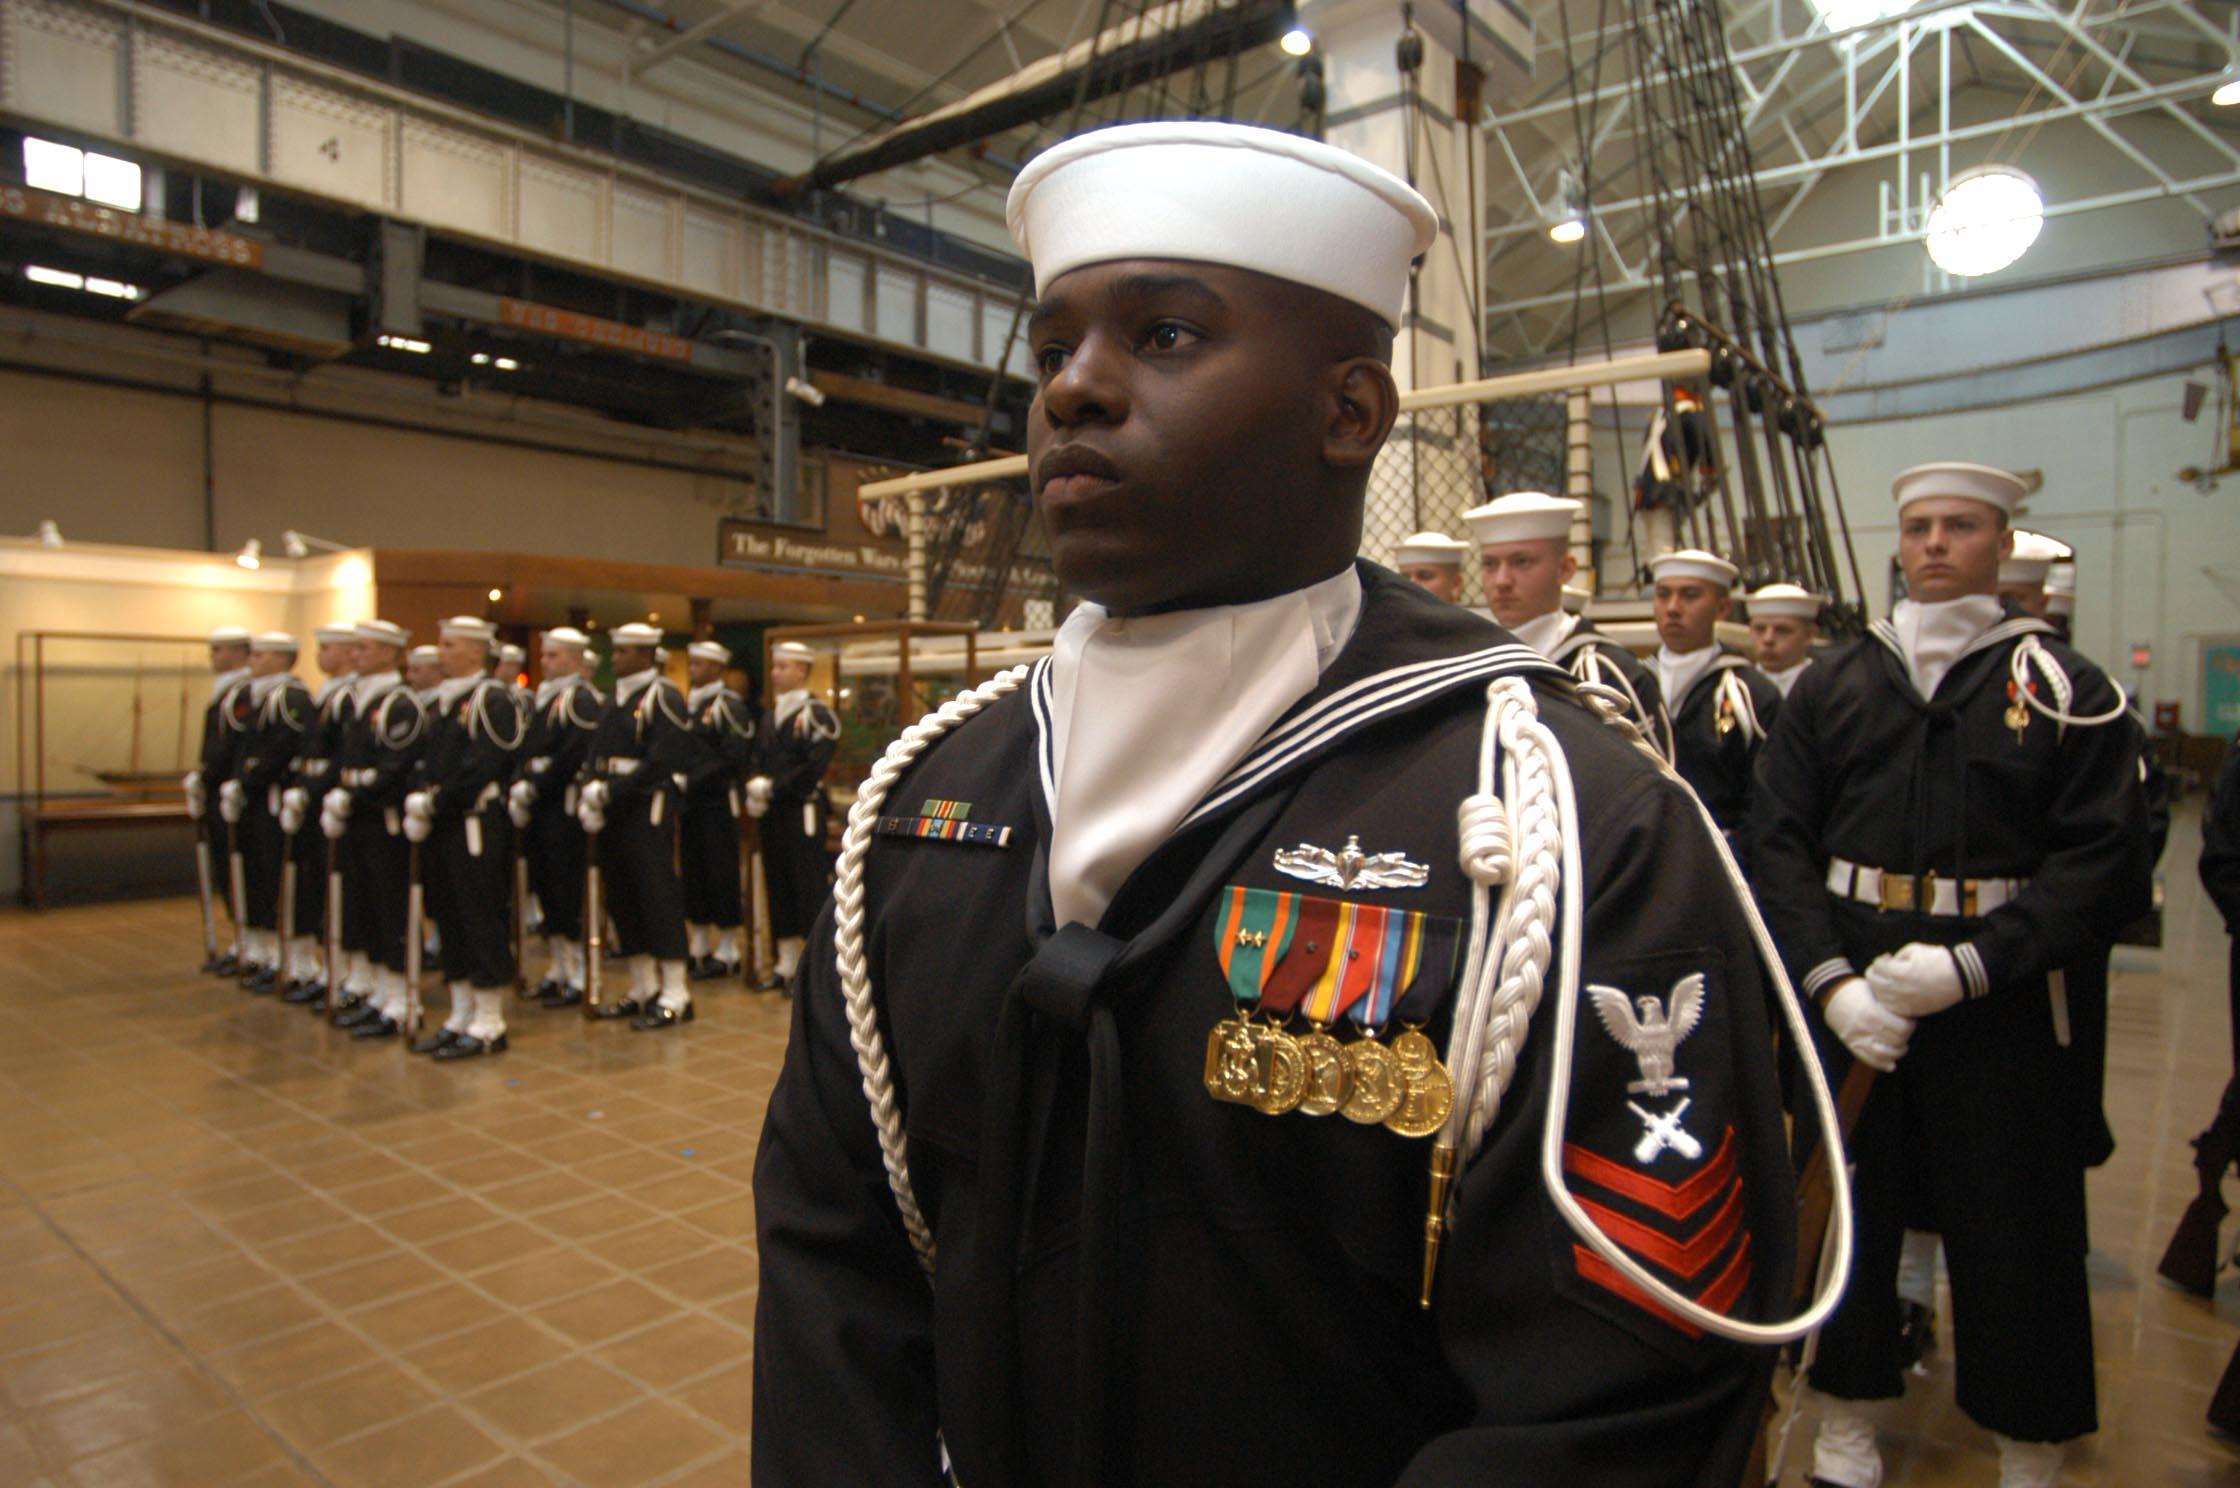 Fileus Navy 031210 N 2383b 029 Us Navy Ceremonial Guard Sailors - Us-navy-ceremonial-guard